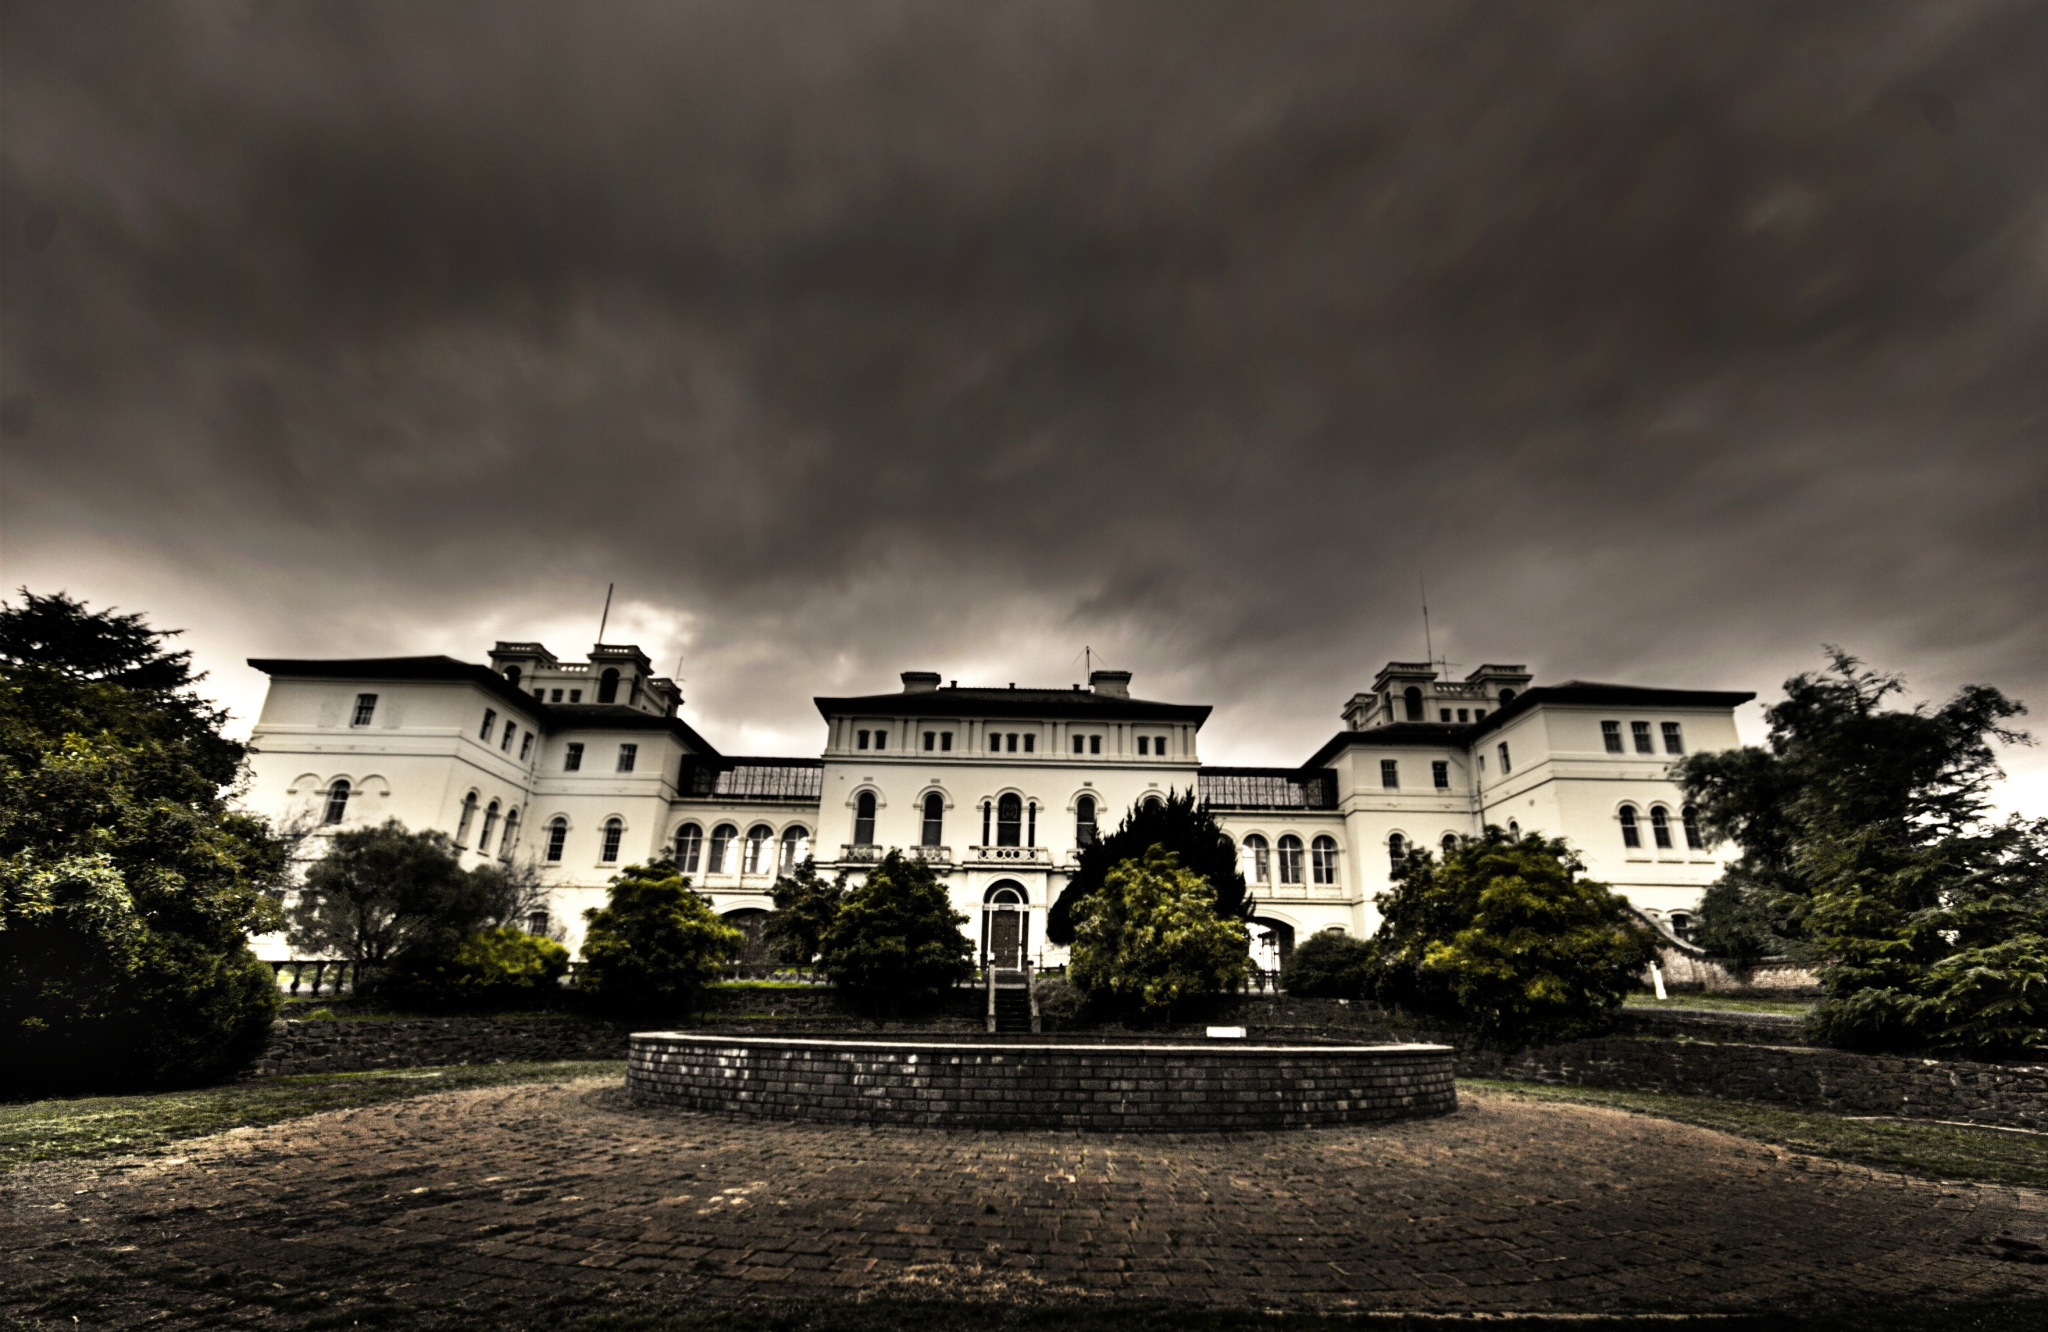 ararat_lunatic_asylum_-_aradale_psychiatric_hospital